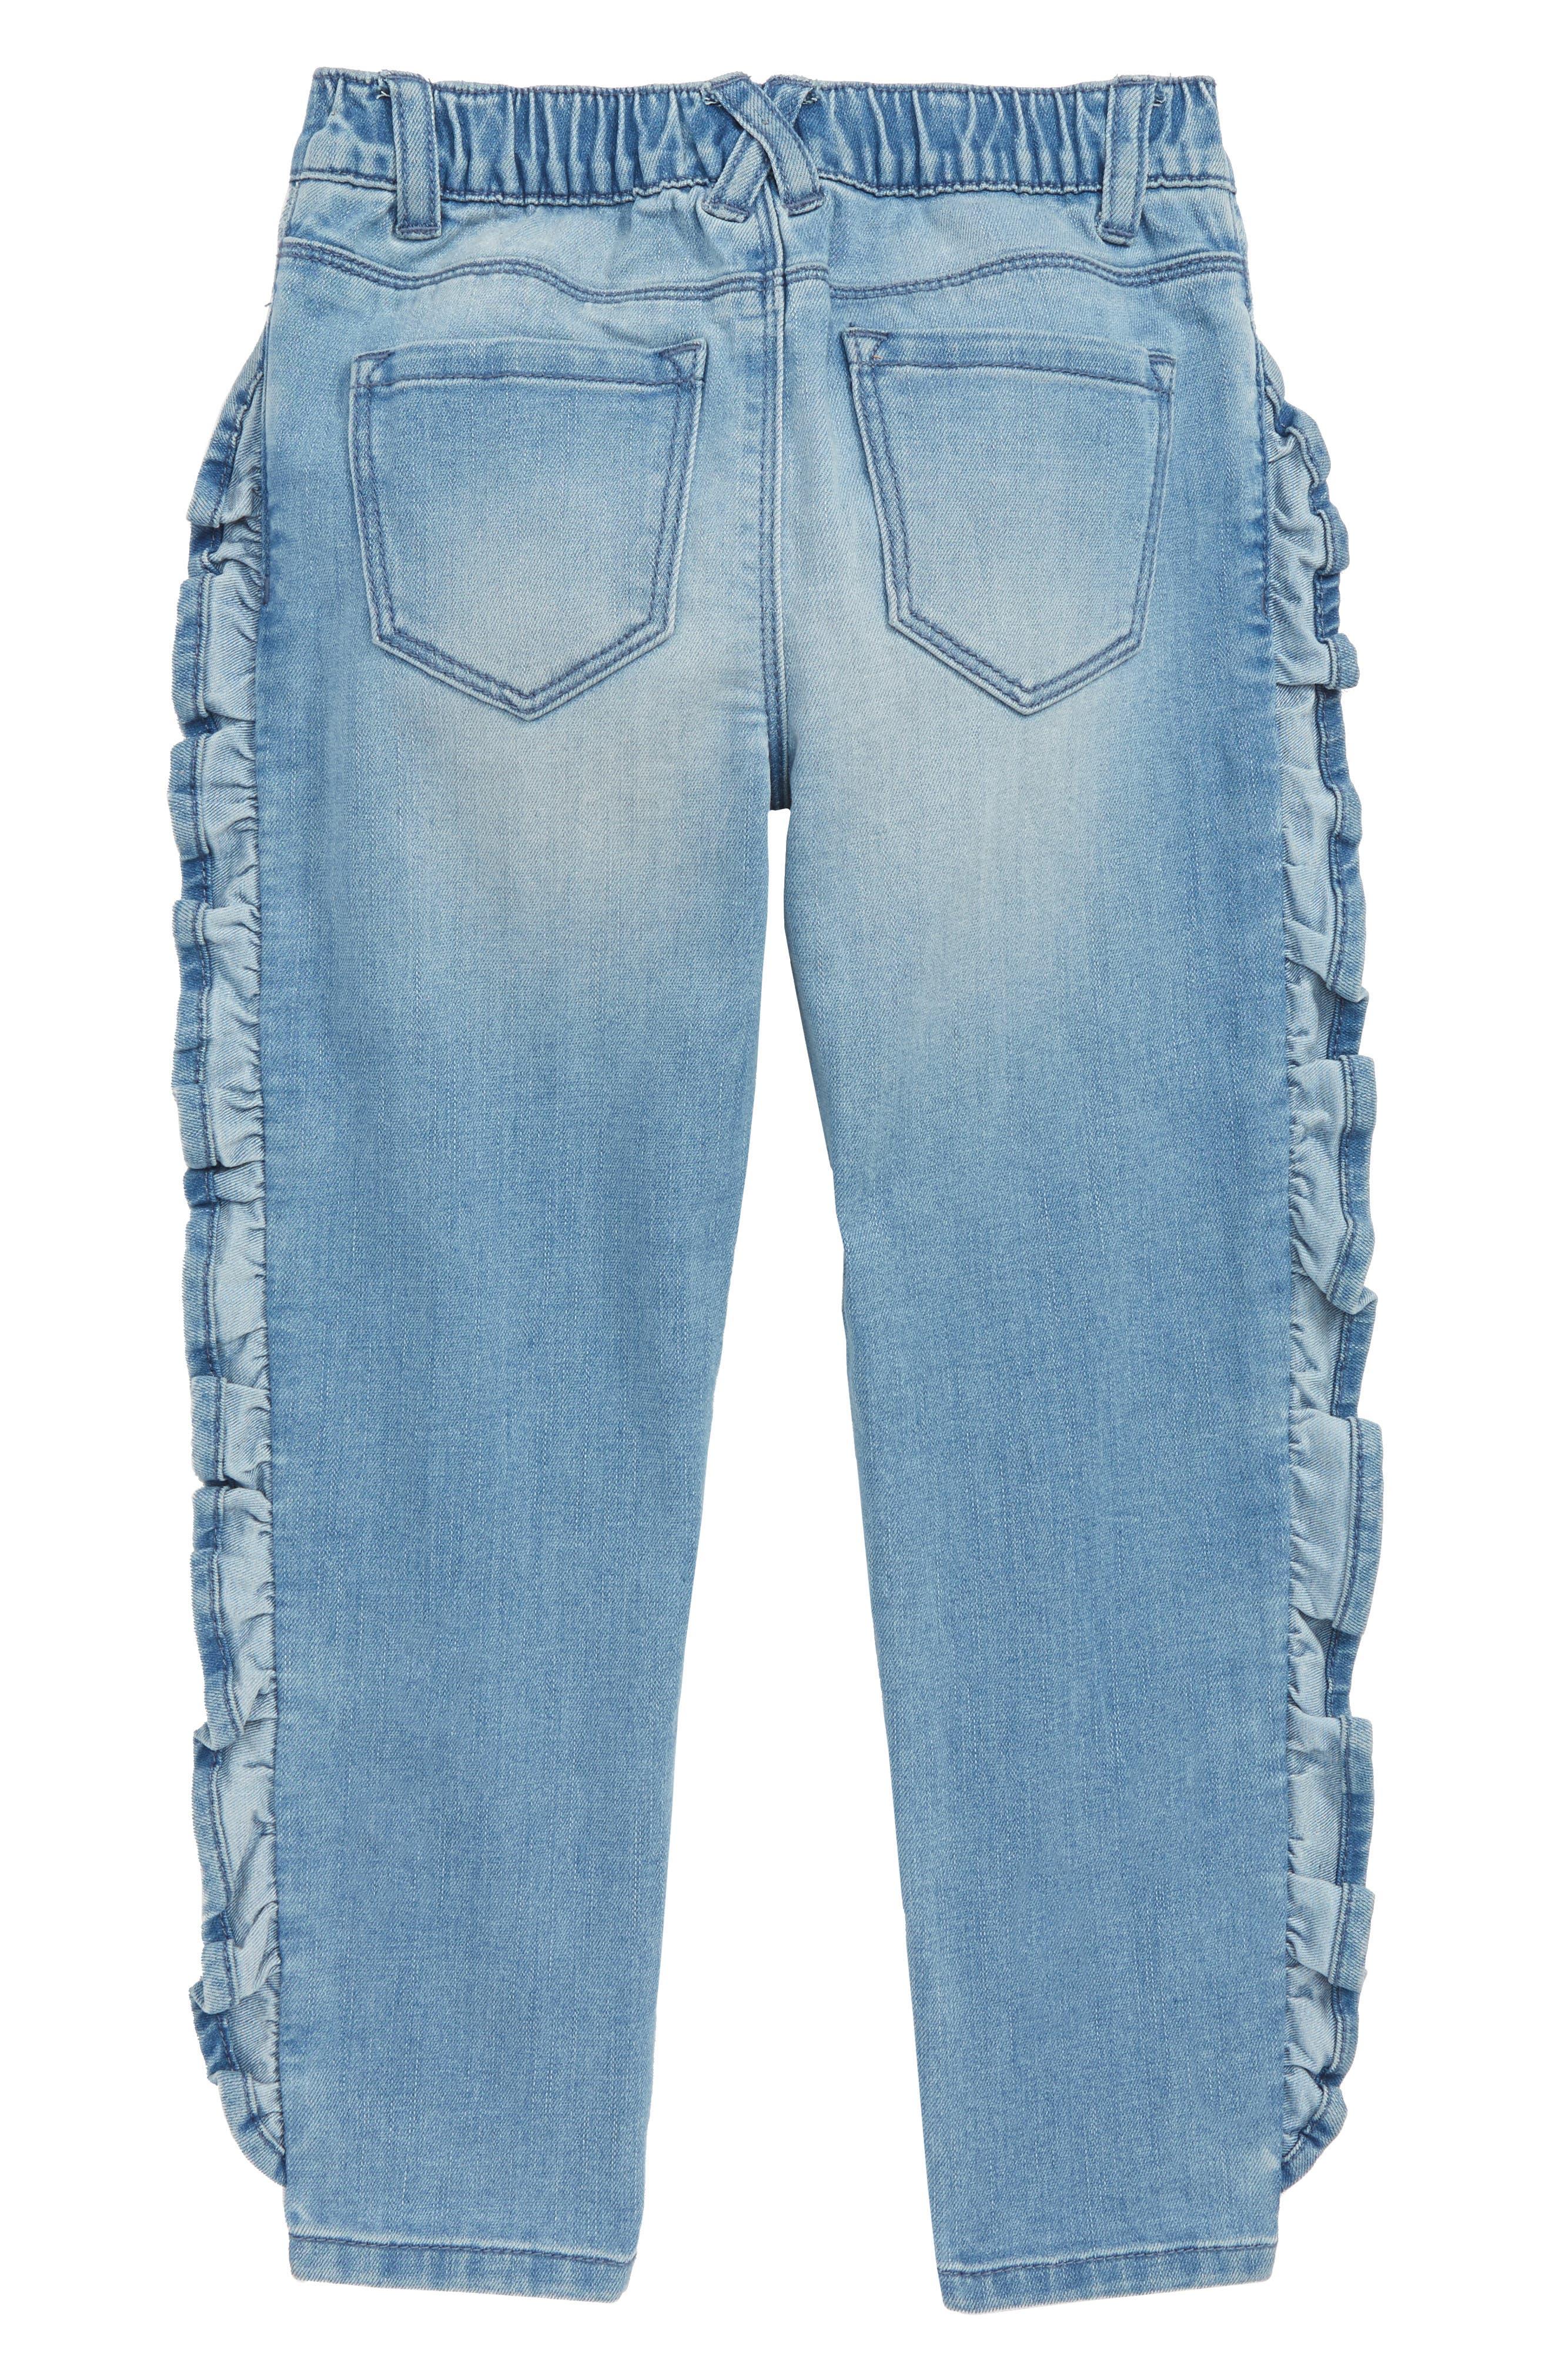 Ruffle Jeans,                             Alternate thumbnail 2, color,                             RUFFLE SKY WASH